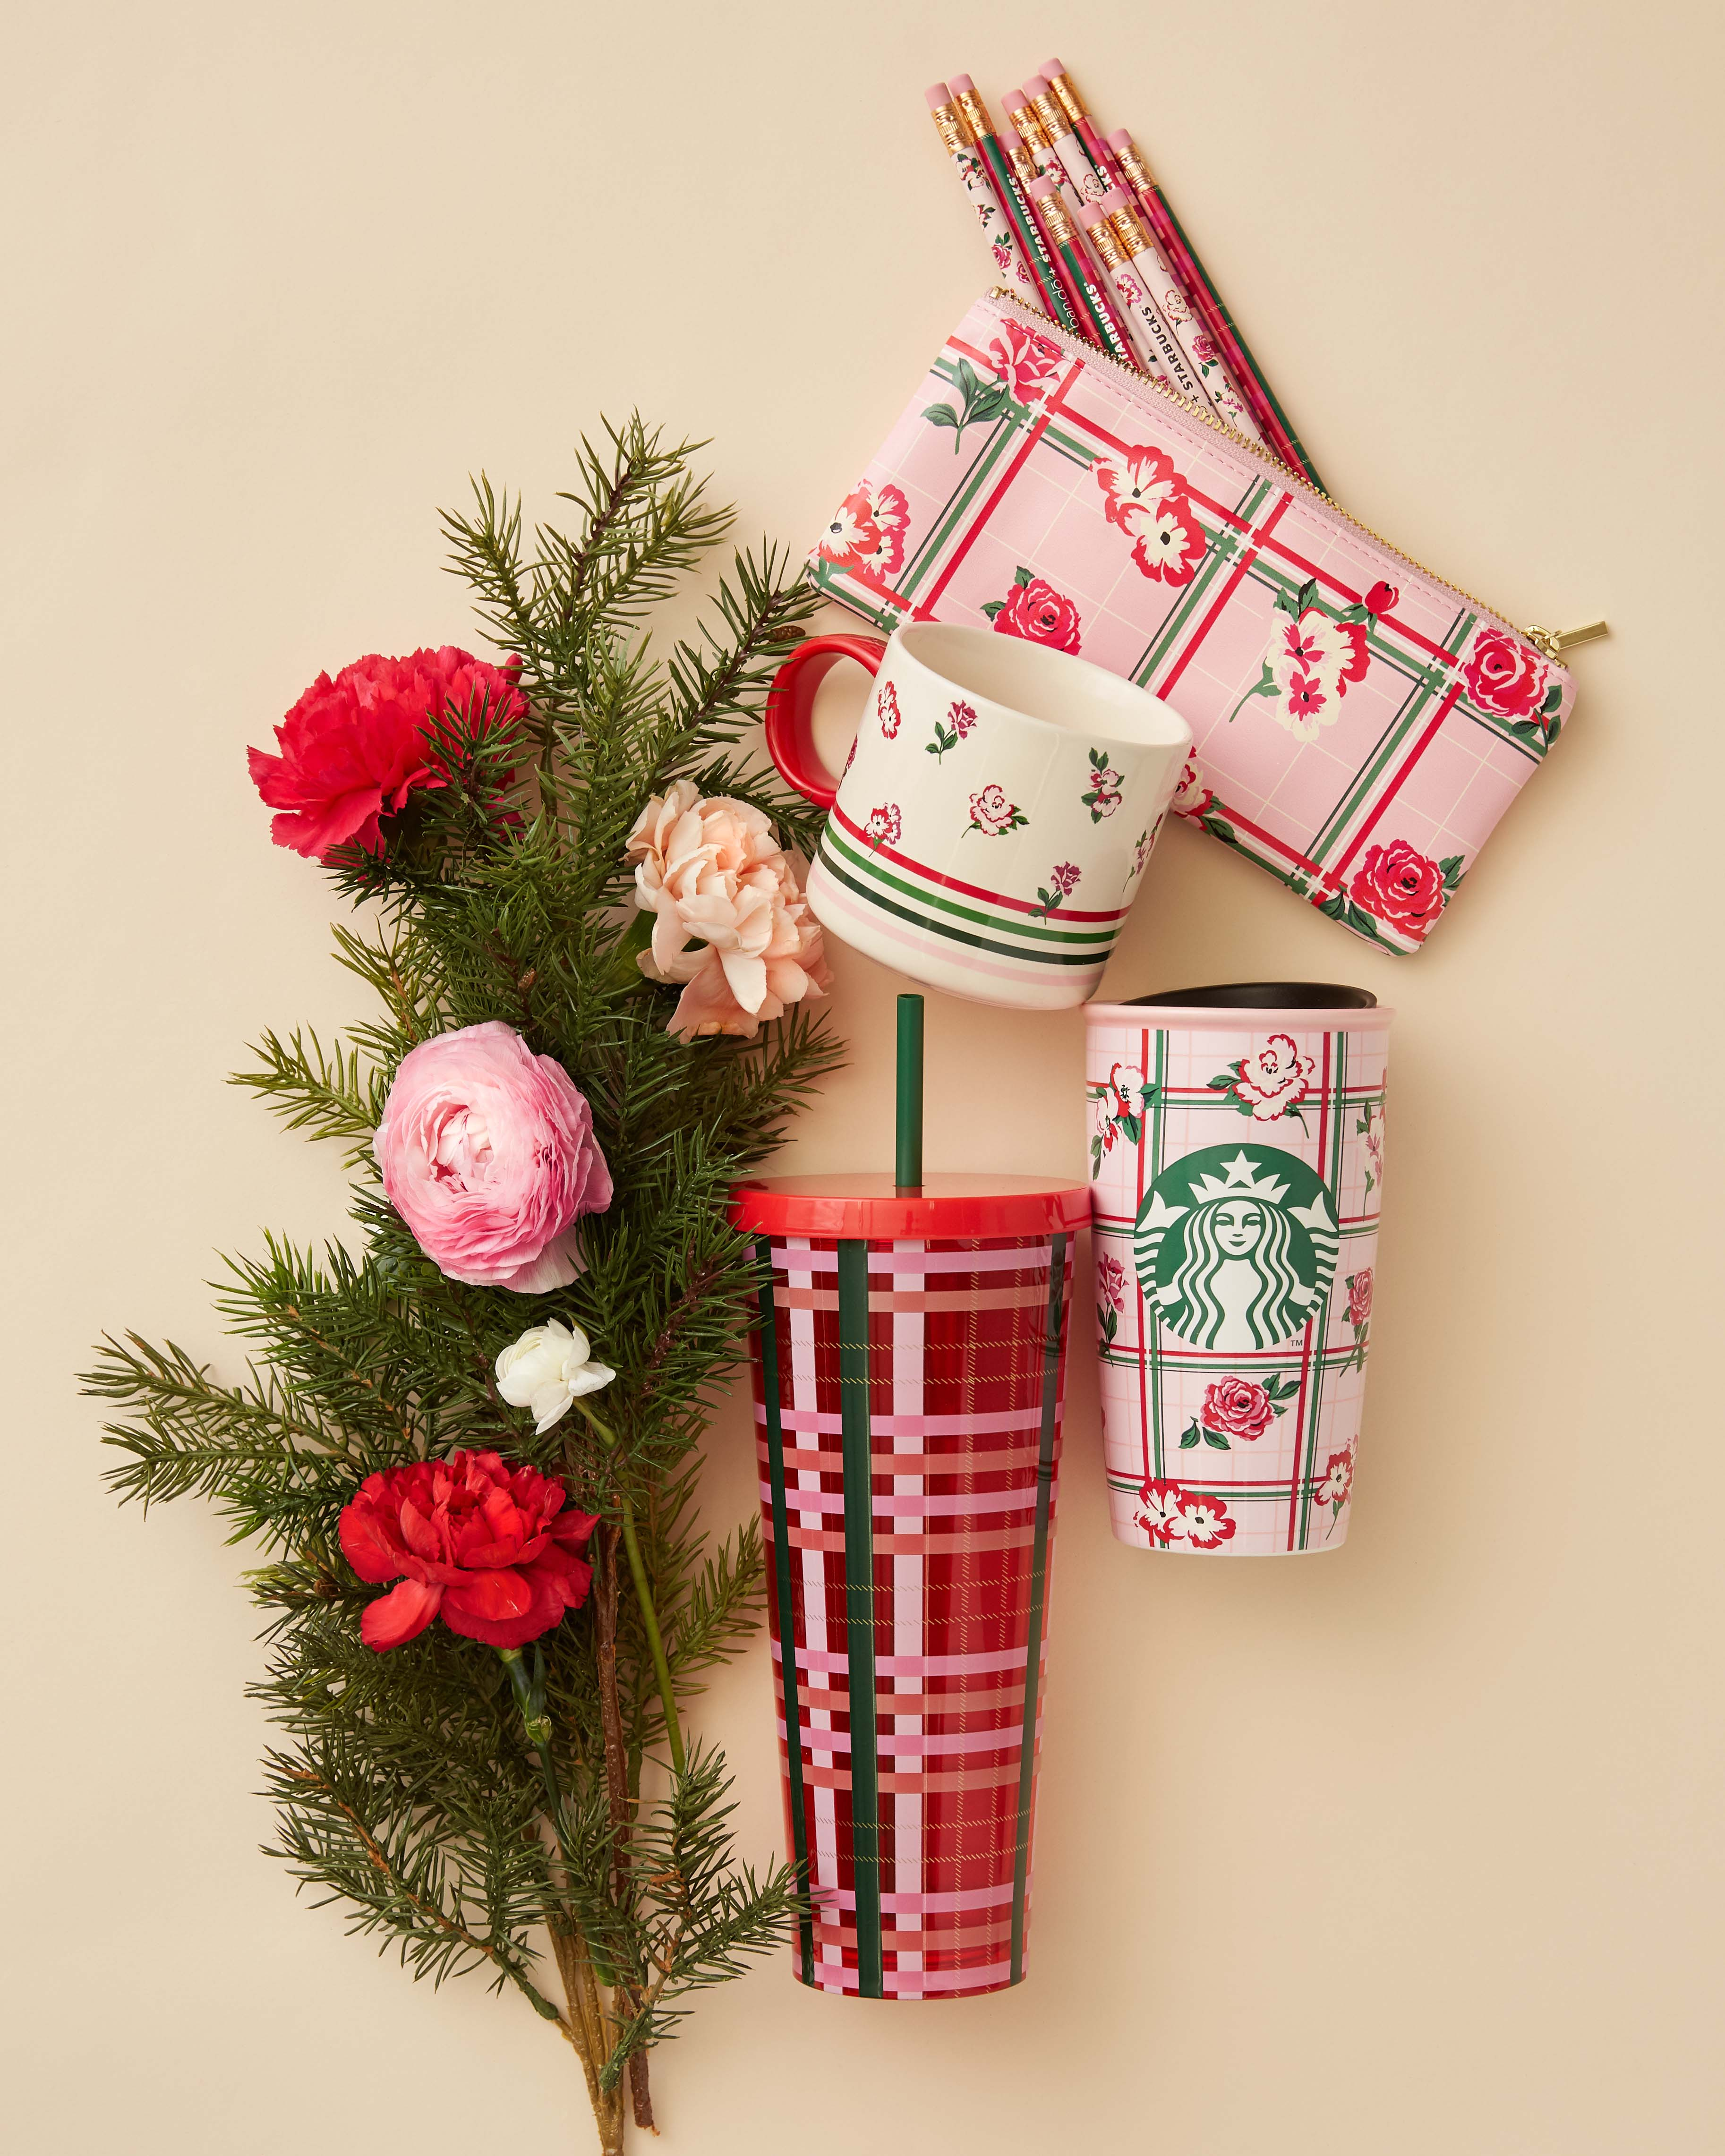 Starbucks Christmas Ornaments 2019.Starbucks Holiday Season 2018